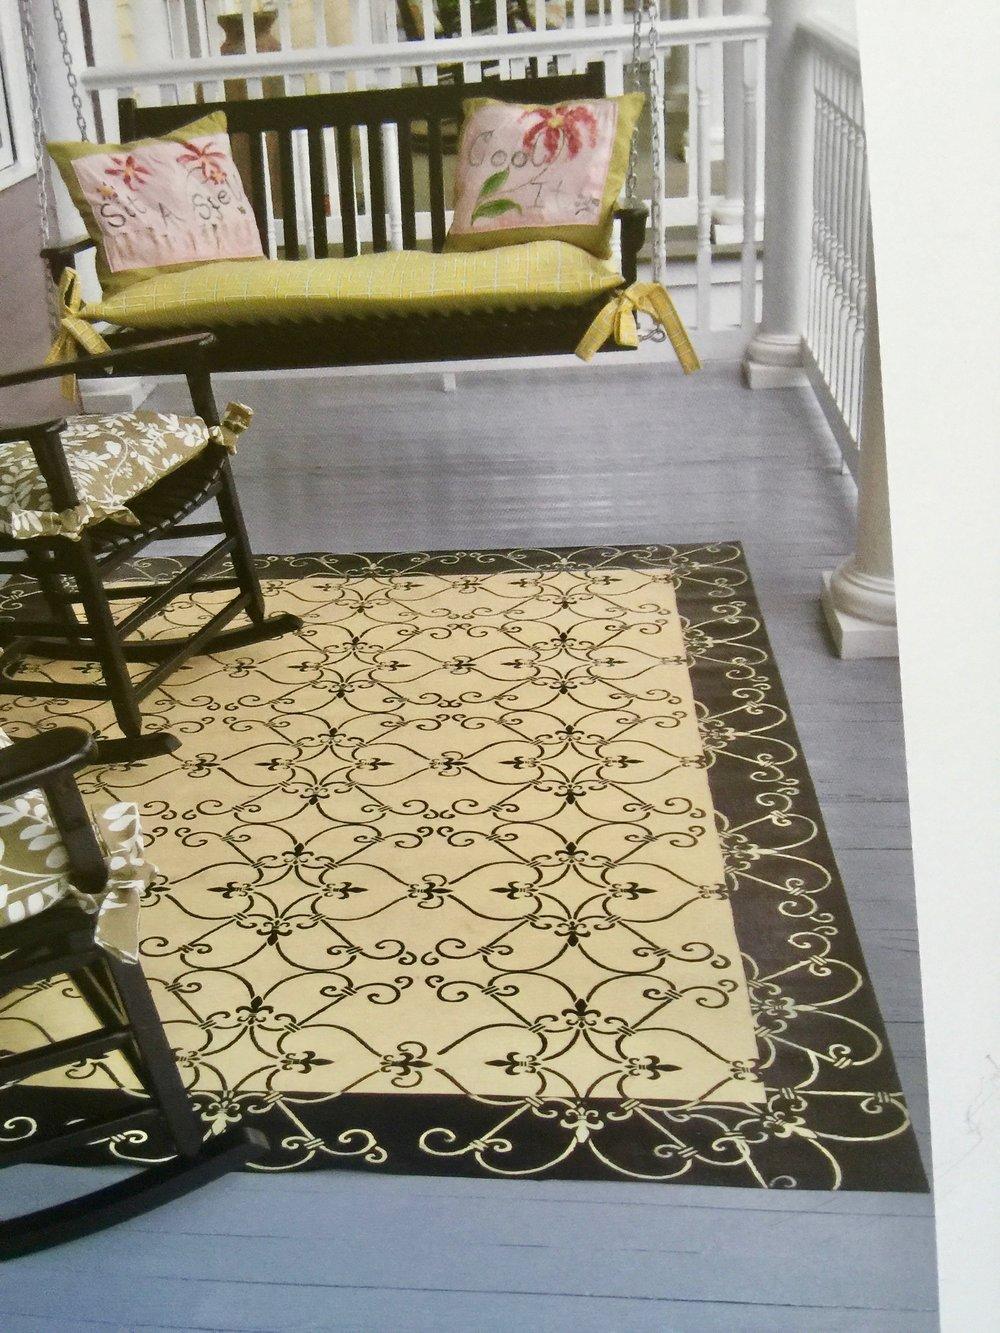 timeless images floors on floor pinterest rug best painted floorcloth gallery iii cloths paint floorcloths